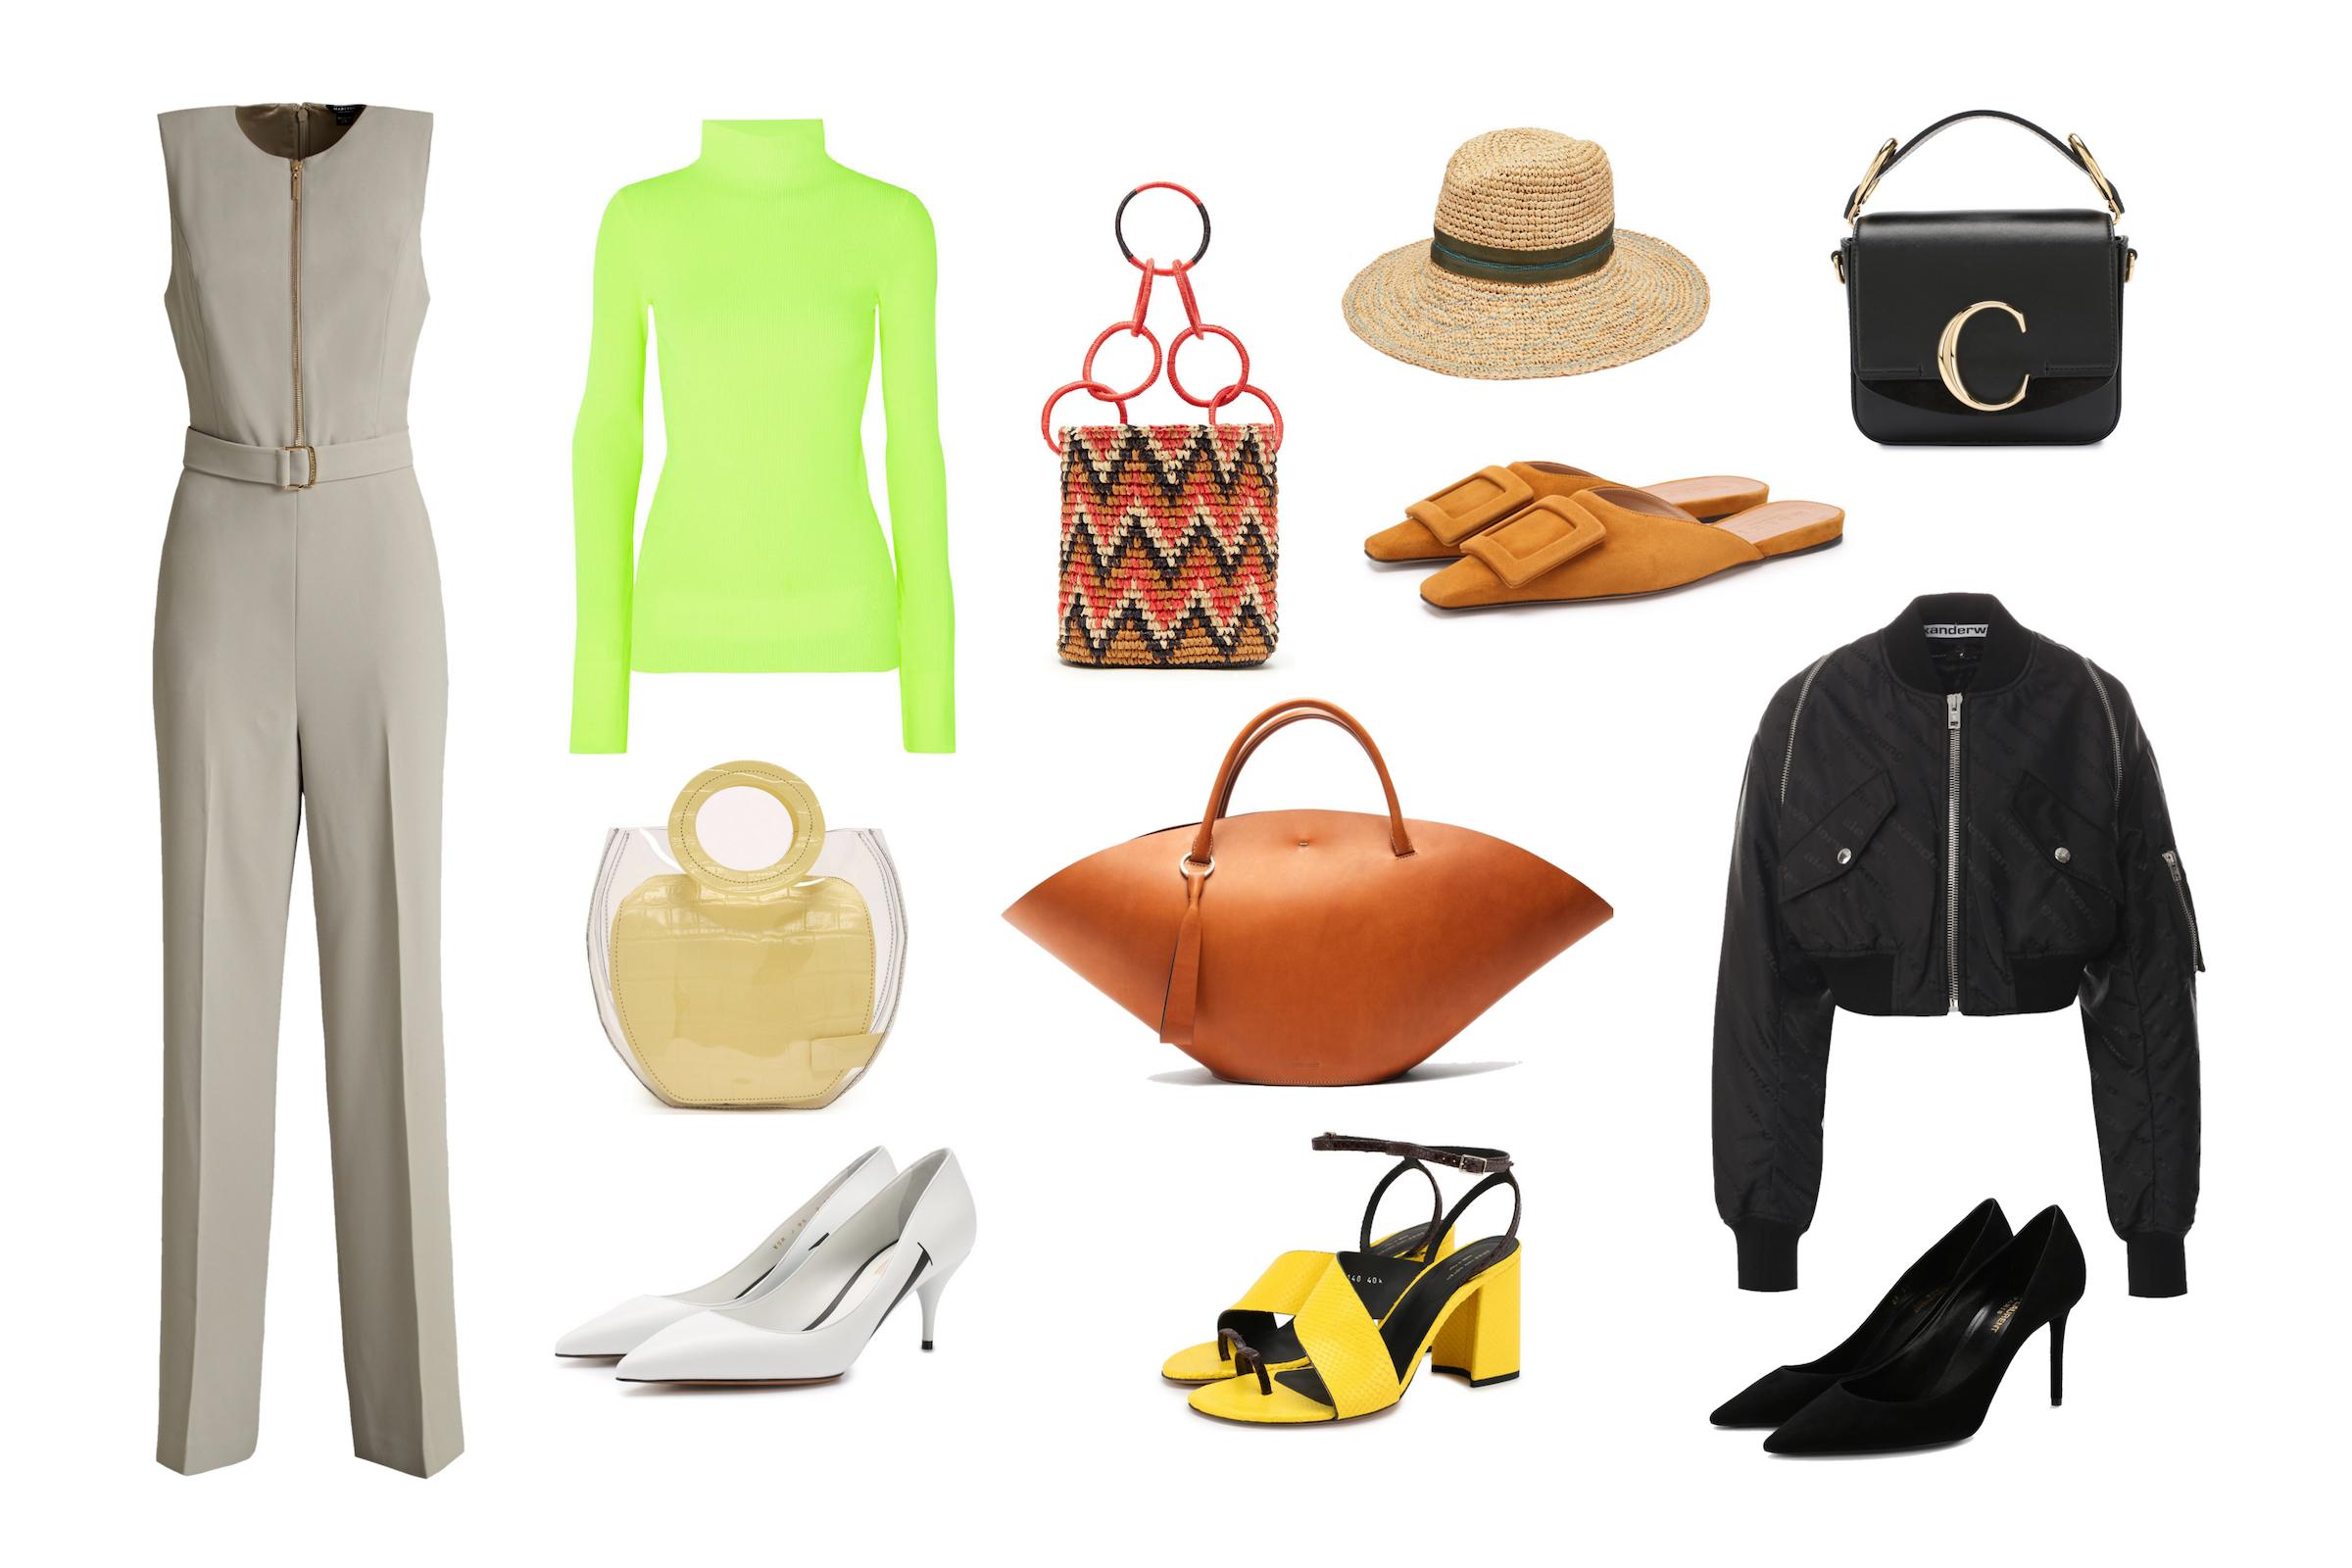 Комбинезон MARCIANO, водолазка HELMUT LANG, сумка STAUD, белые туфли VALENTINO GARAVANI, плетеная сумка SENSI STUDIO, сумка JIL SANDER, желтые босоножки DRIES VAN NOTEN, шляпа LOLA HATS, мюли MARNI, клатч CHLOE, бомбер ALEXANDER WANG, черные туфли SAINT LAURENT